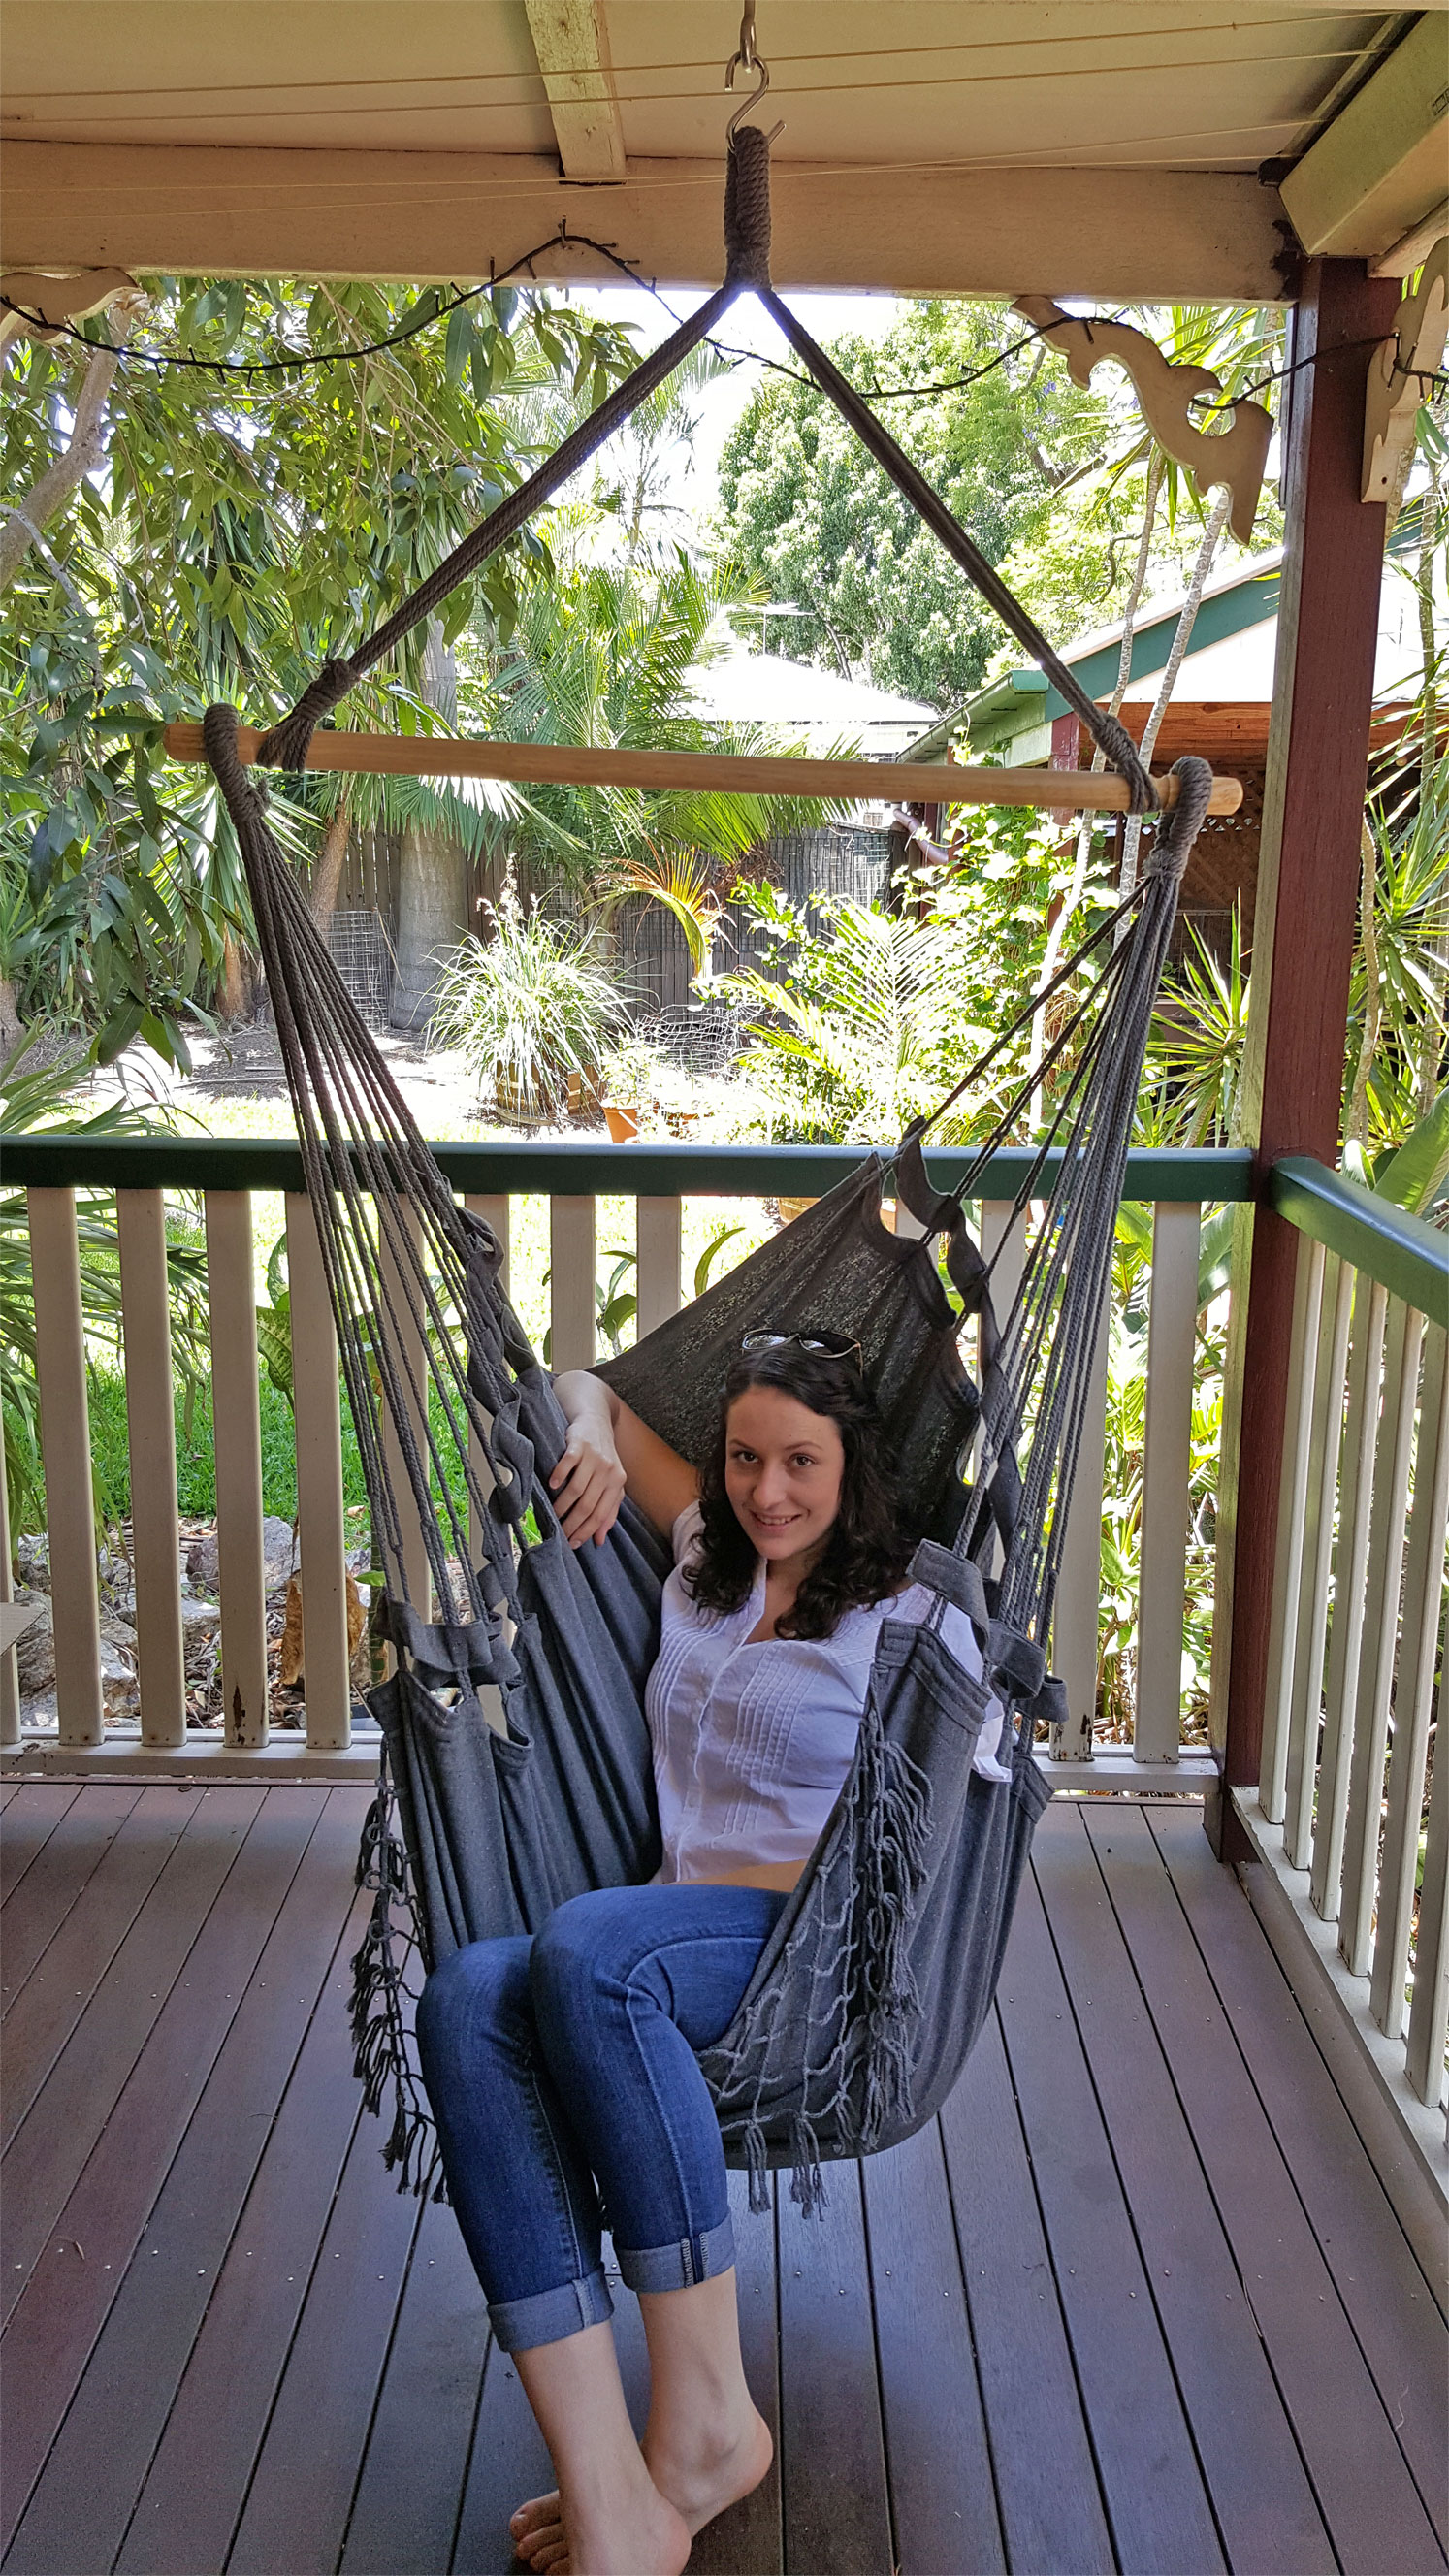 Black Canvas Hammock Chair With Tassels - Heavenly Hammocks